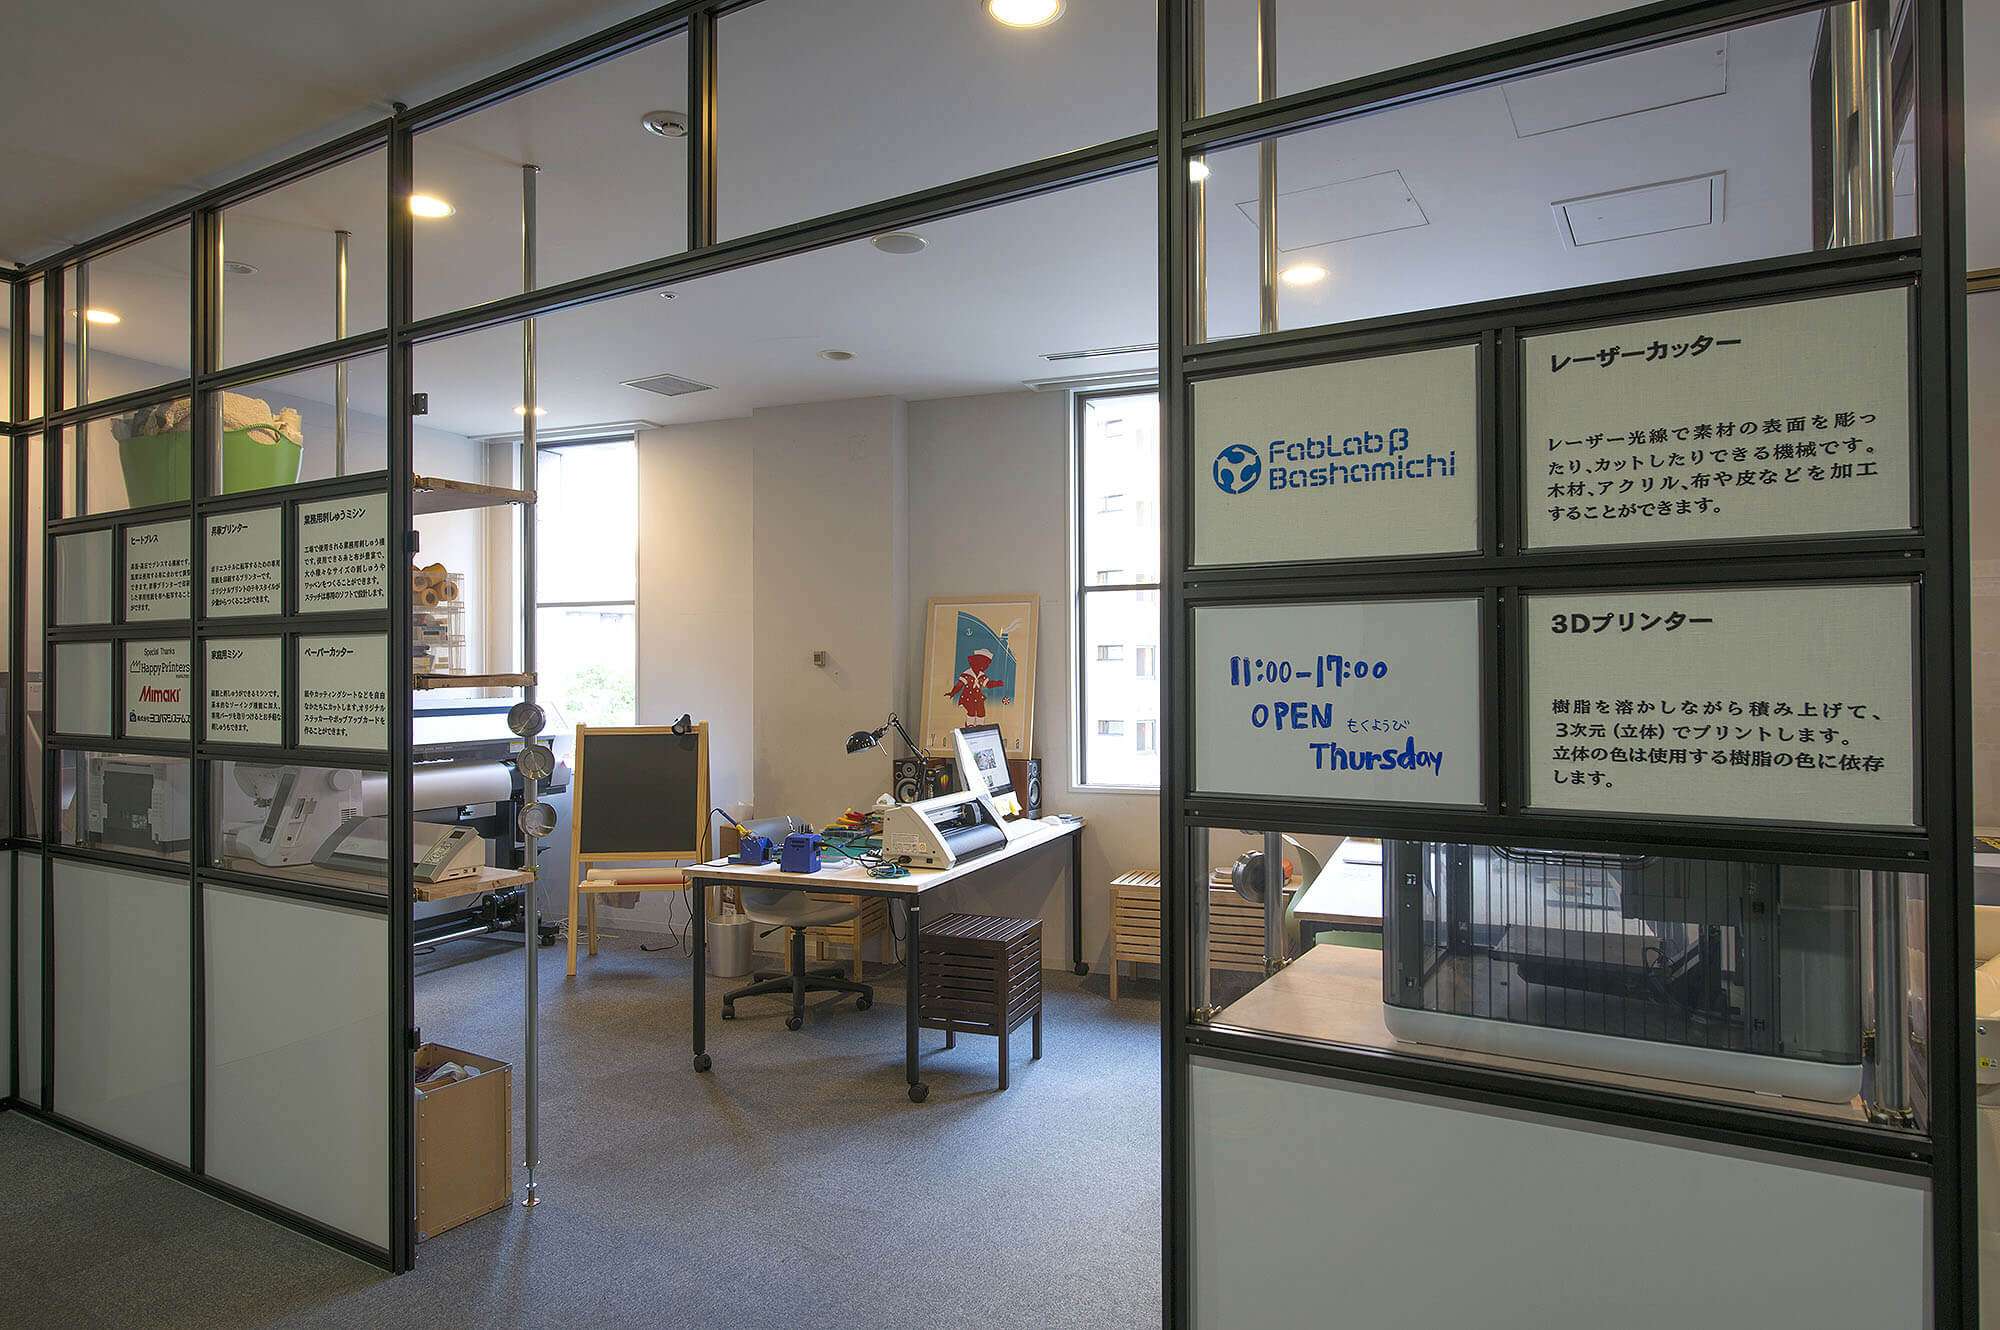 YCC ヨコハマ創造都市センター 運営計画・施設運営|offsociety inc. YCC Yokohama CreativeCity Center 現代美術・アート Contemporary Art